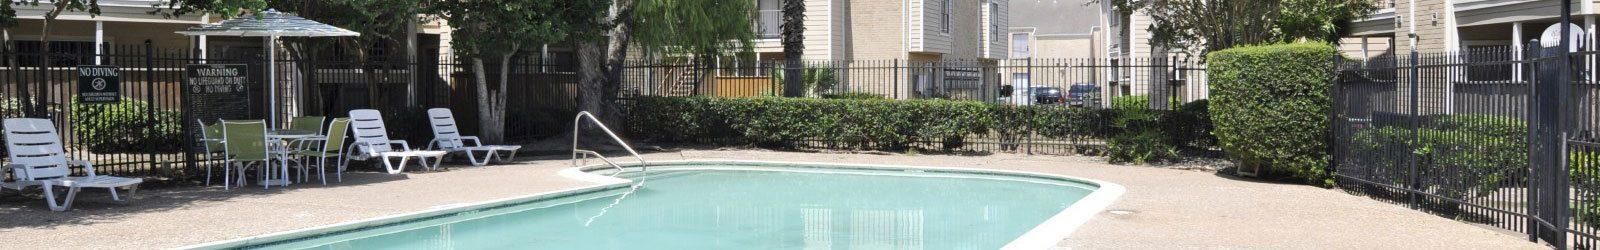 1 & 2 Bedroom Apartments in Houston, TX